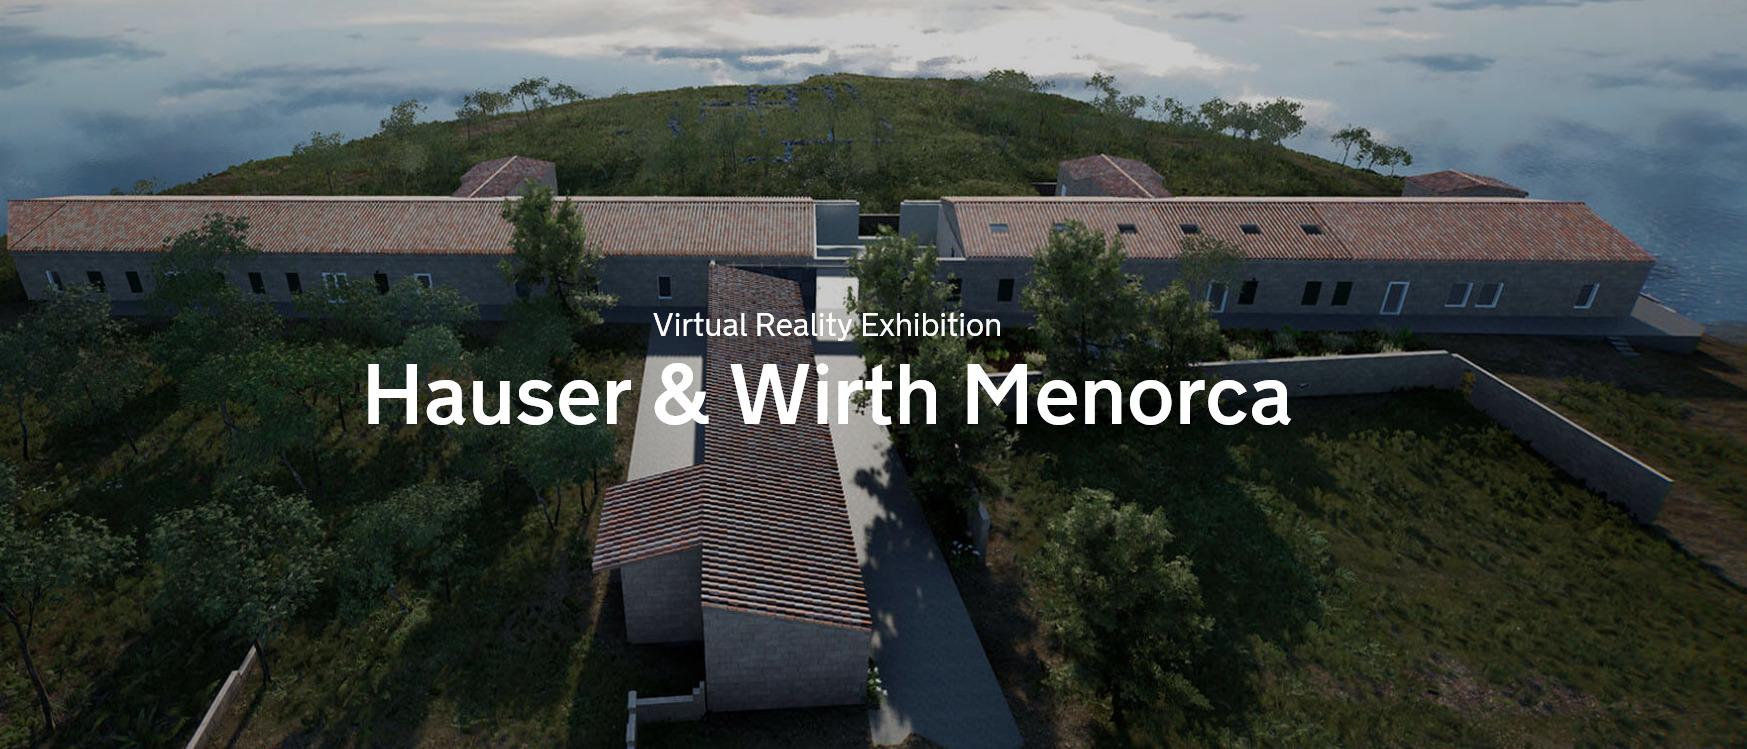 Virtual Reality Exhibition Hauser & Wirth Menorca